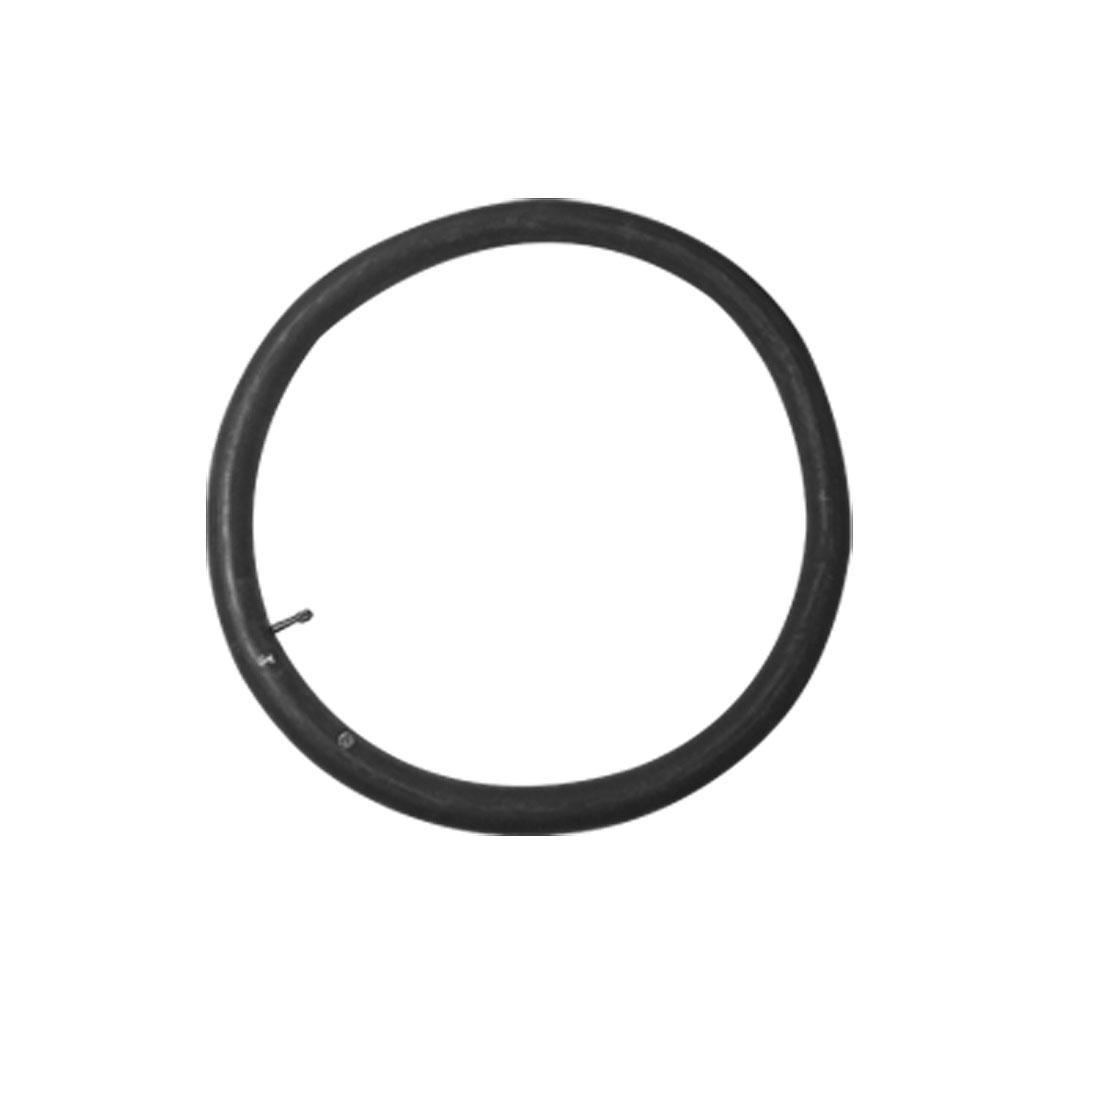 20 x 1.75 Type Black Inner Tube Tire for Bike Bicycle